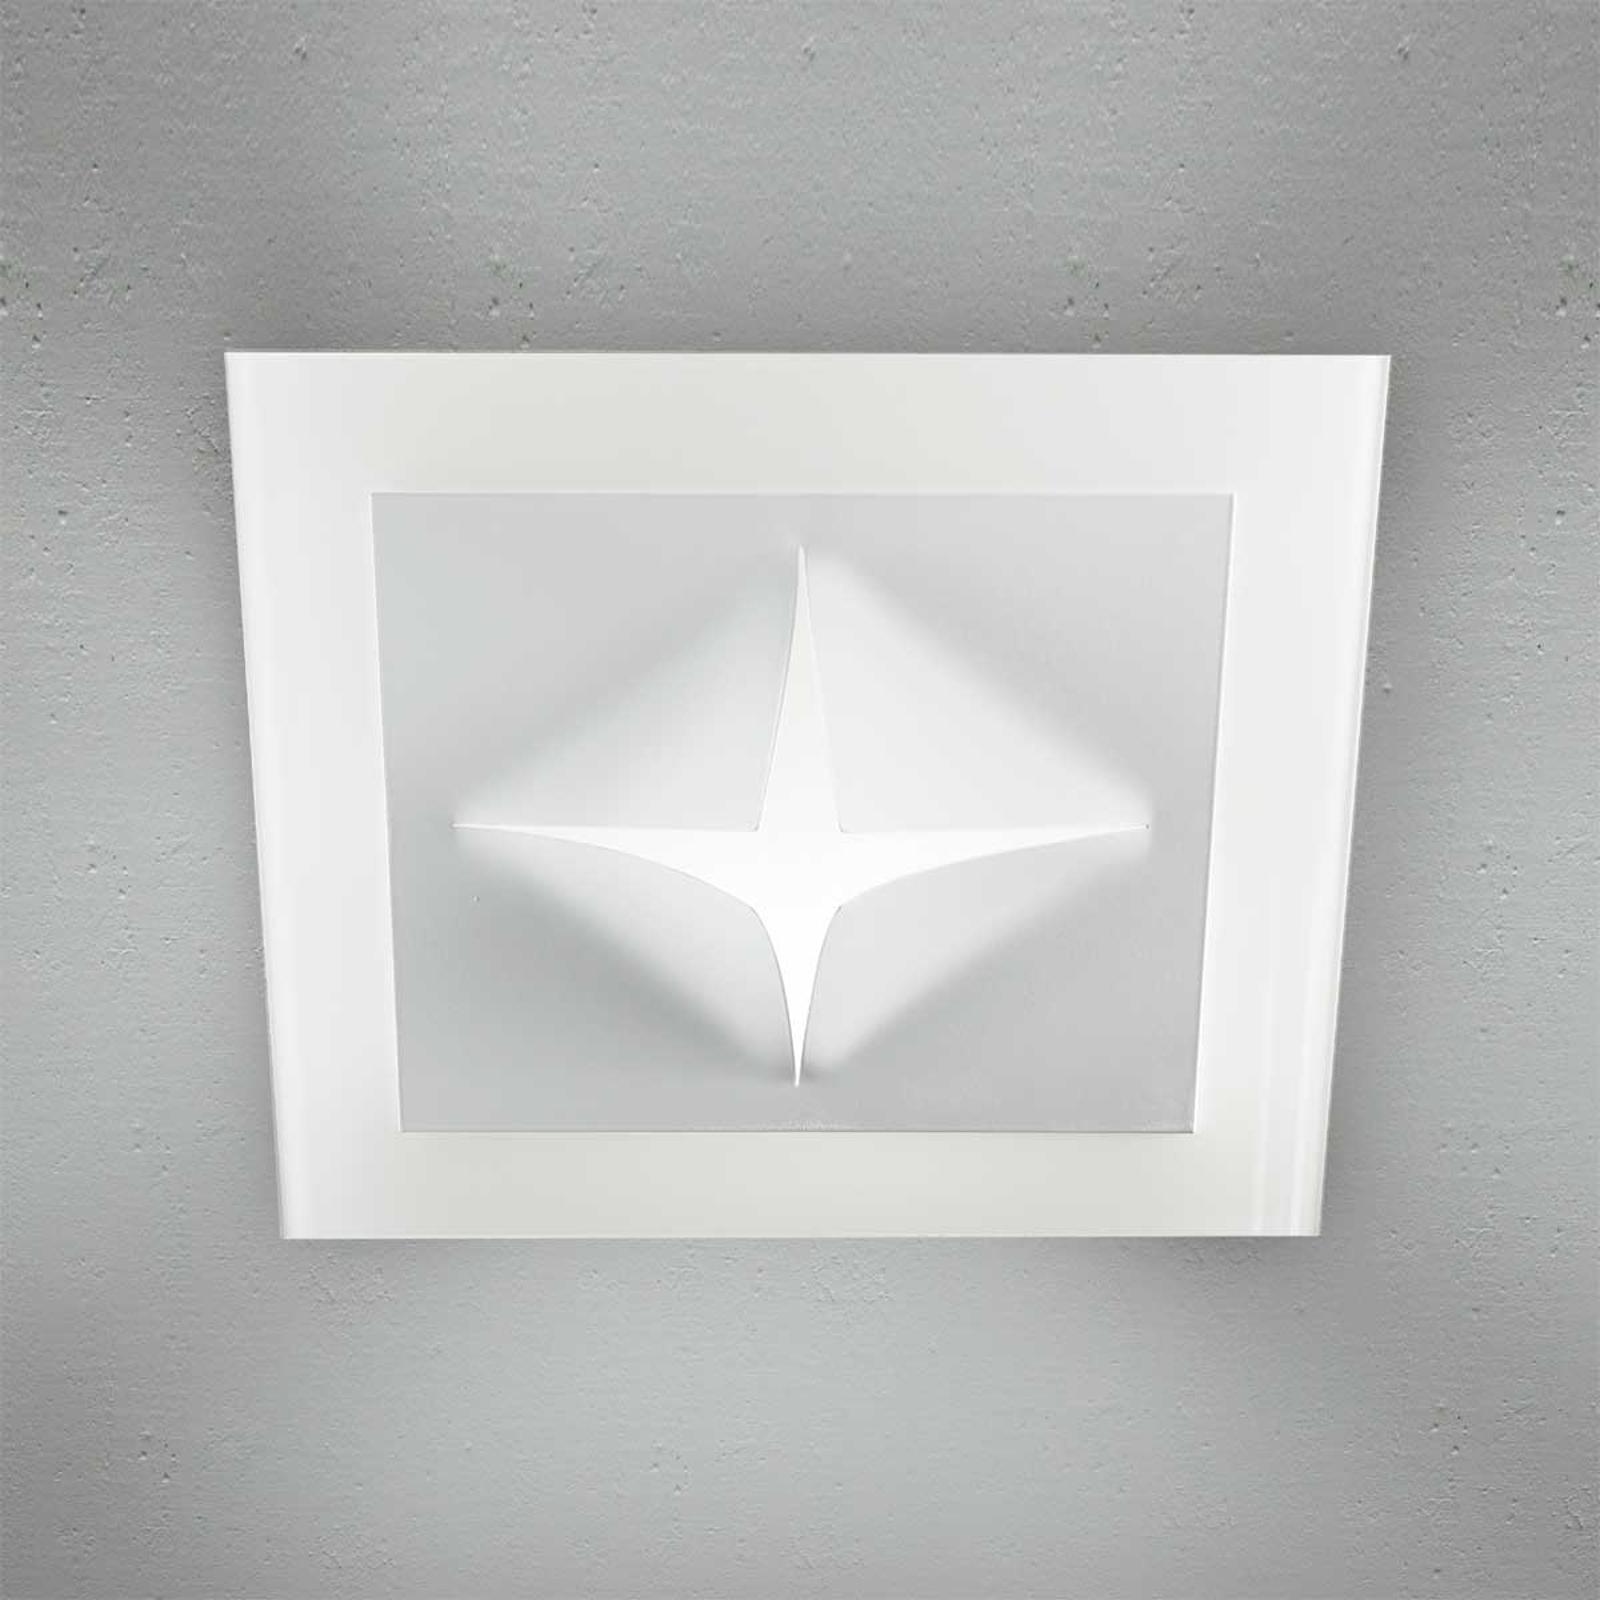 Kekseliäs kattovalaisin Cross 8195 E27 40 cm